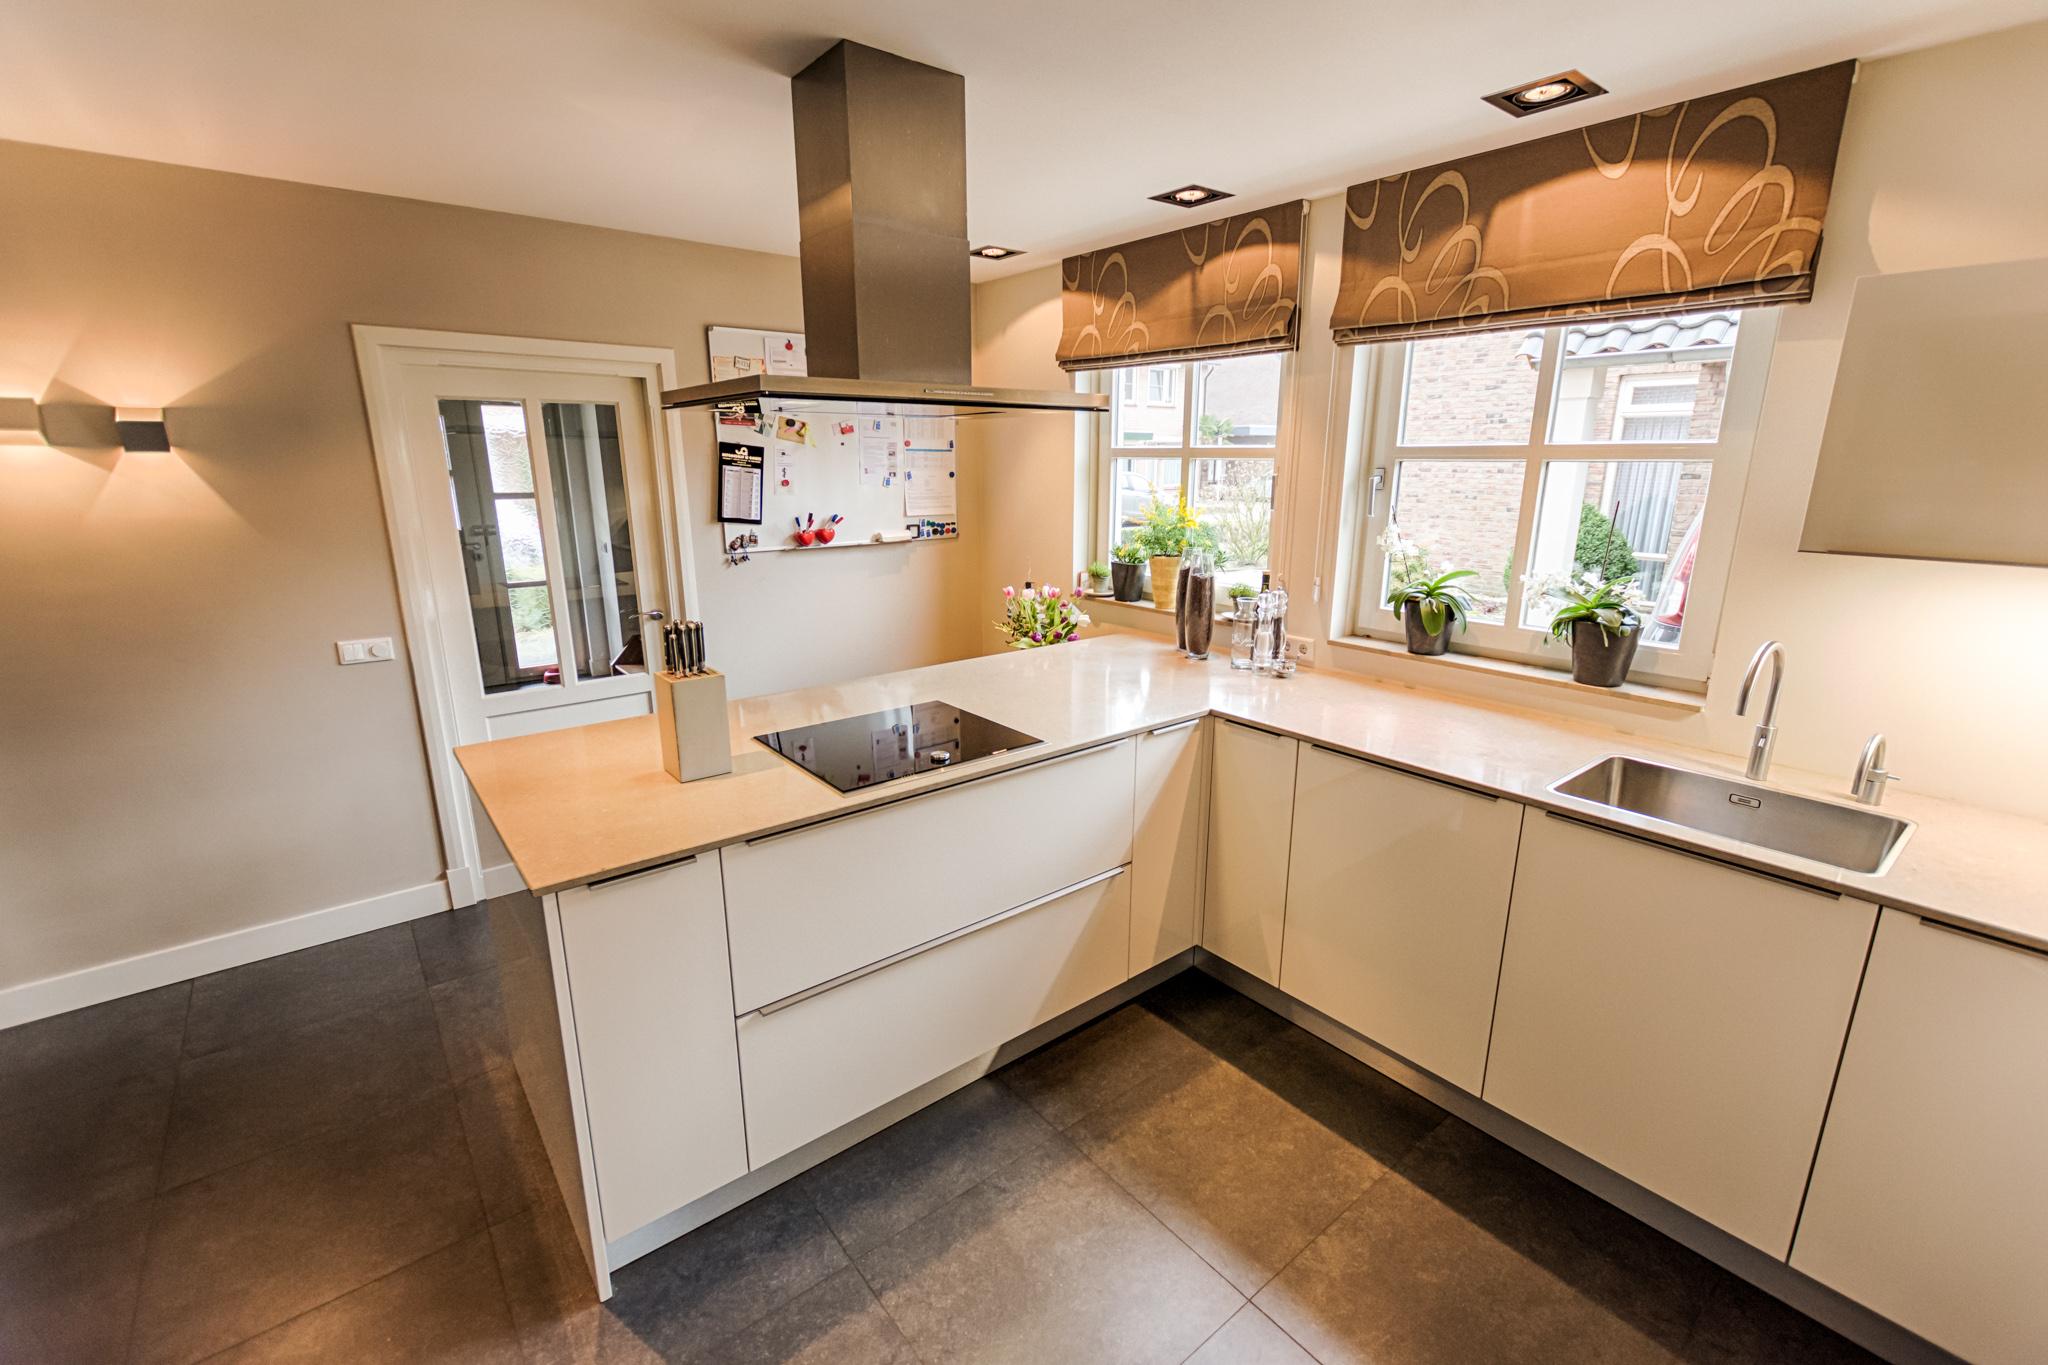 Design keuken forest keukens - Keuken minimalistisch design ...